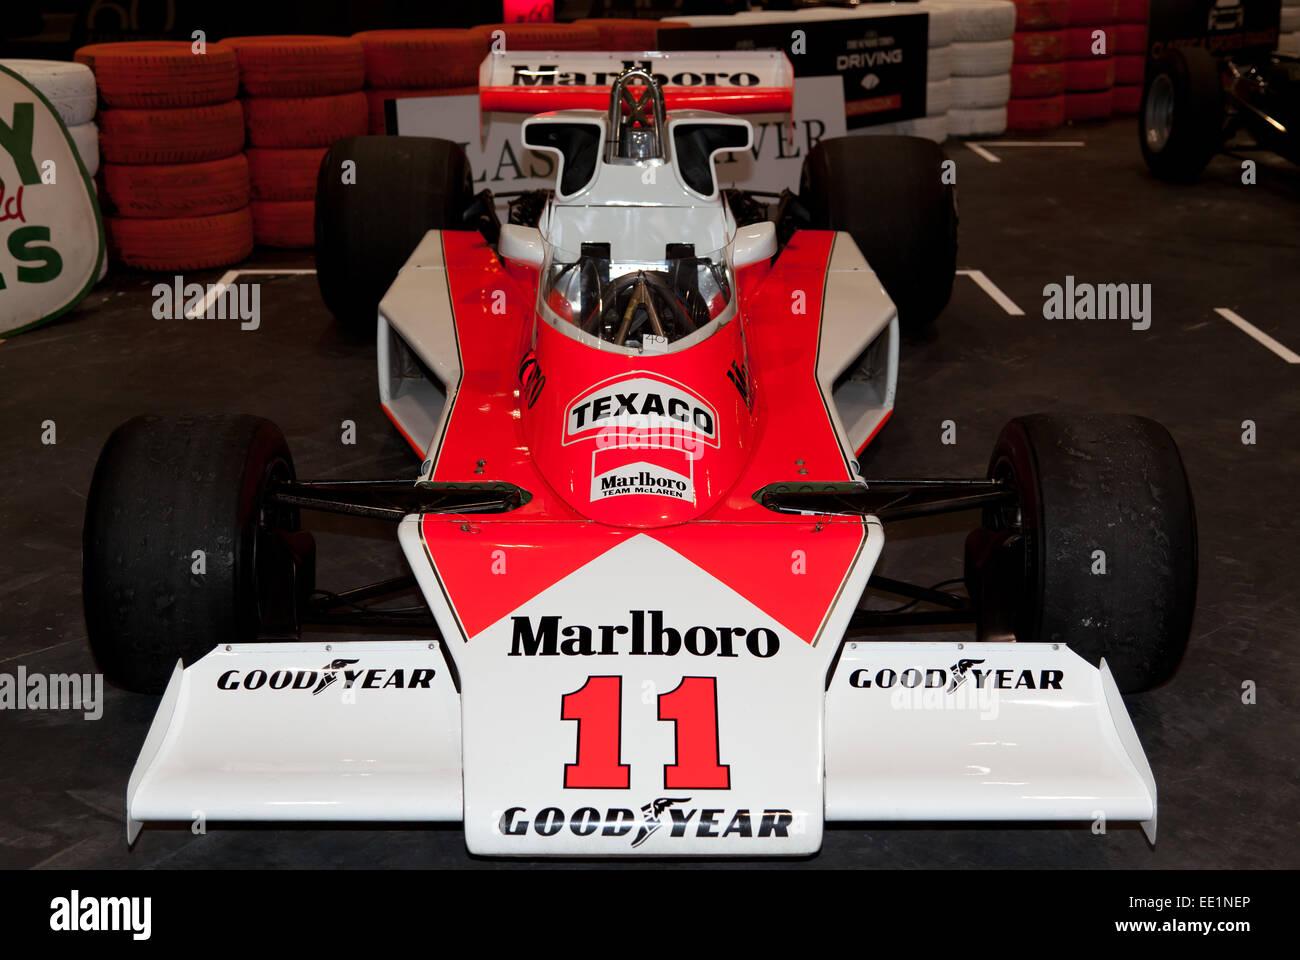 Front view of a McLaren M23 Formula 1 race car driven by Denny Hulme, Jochen Mass, James Hunt and Emilio de Villota, - Stock Image